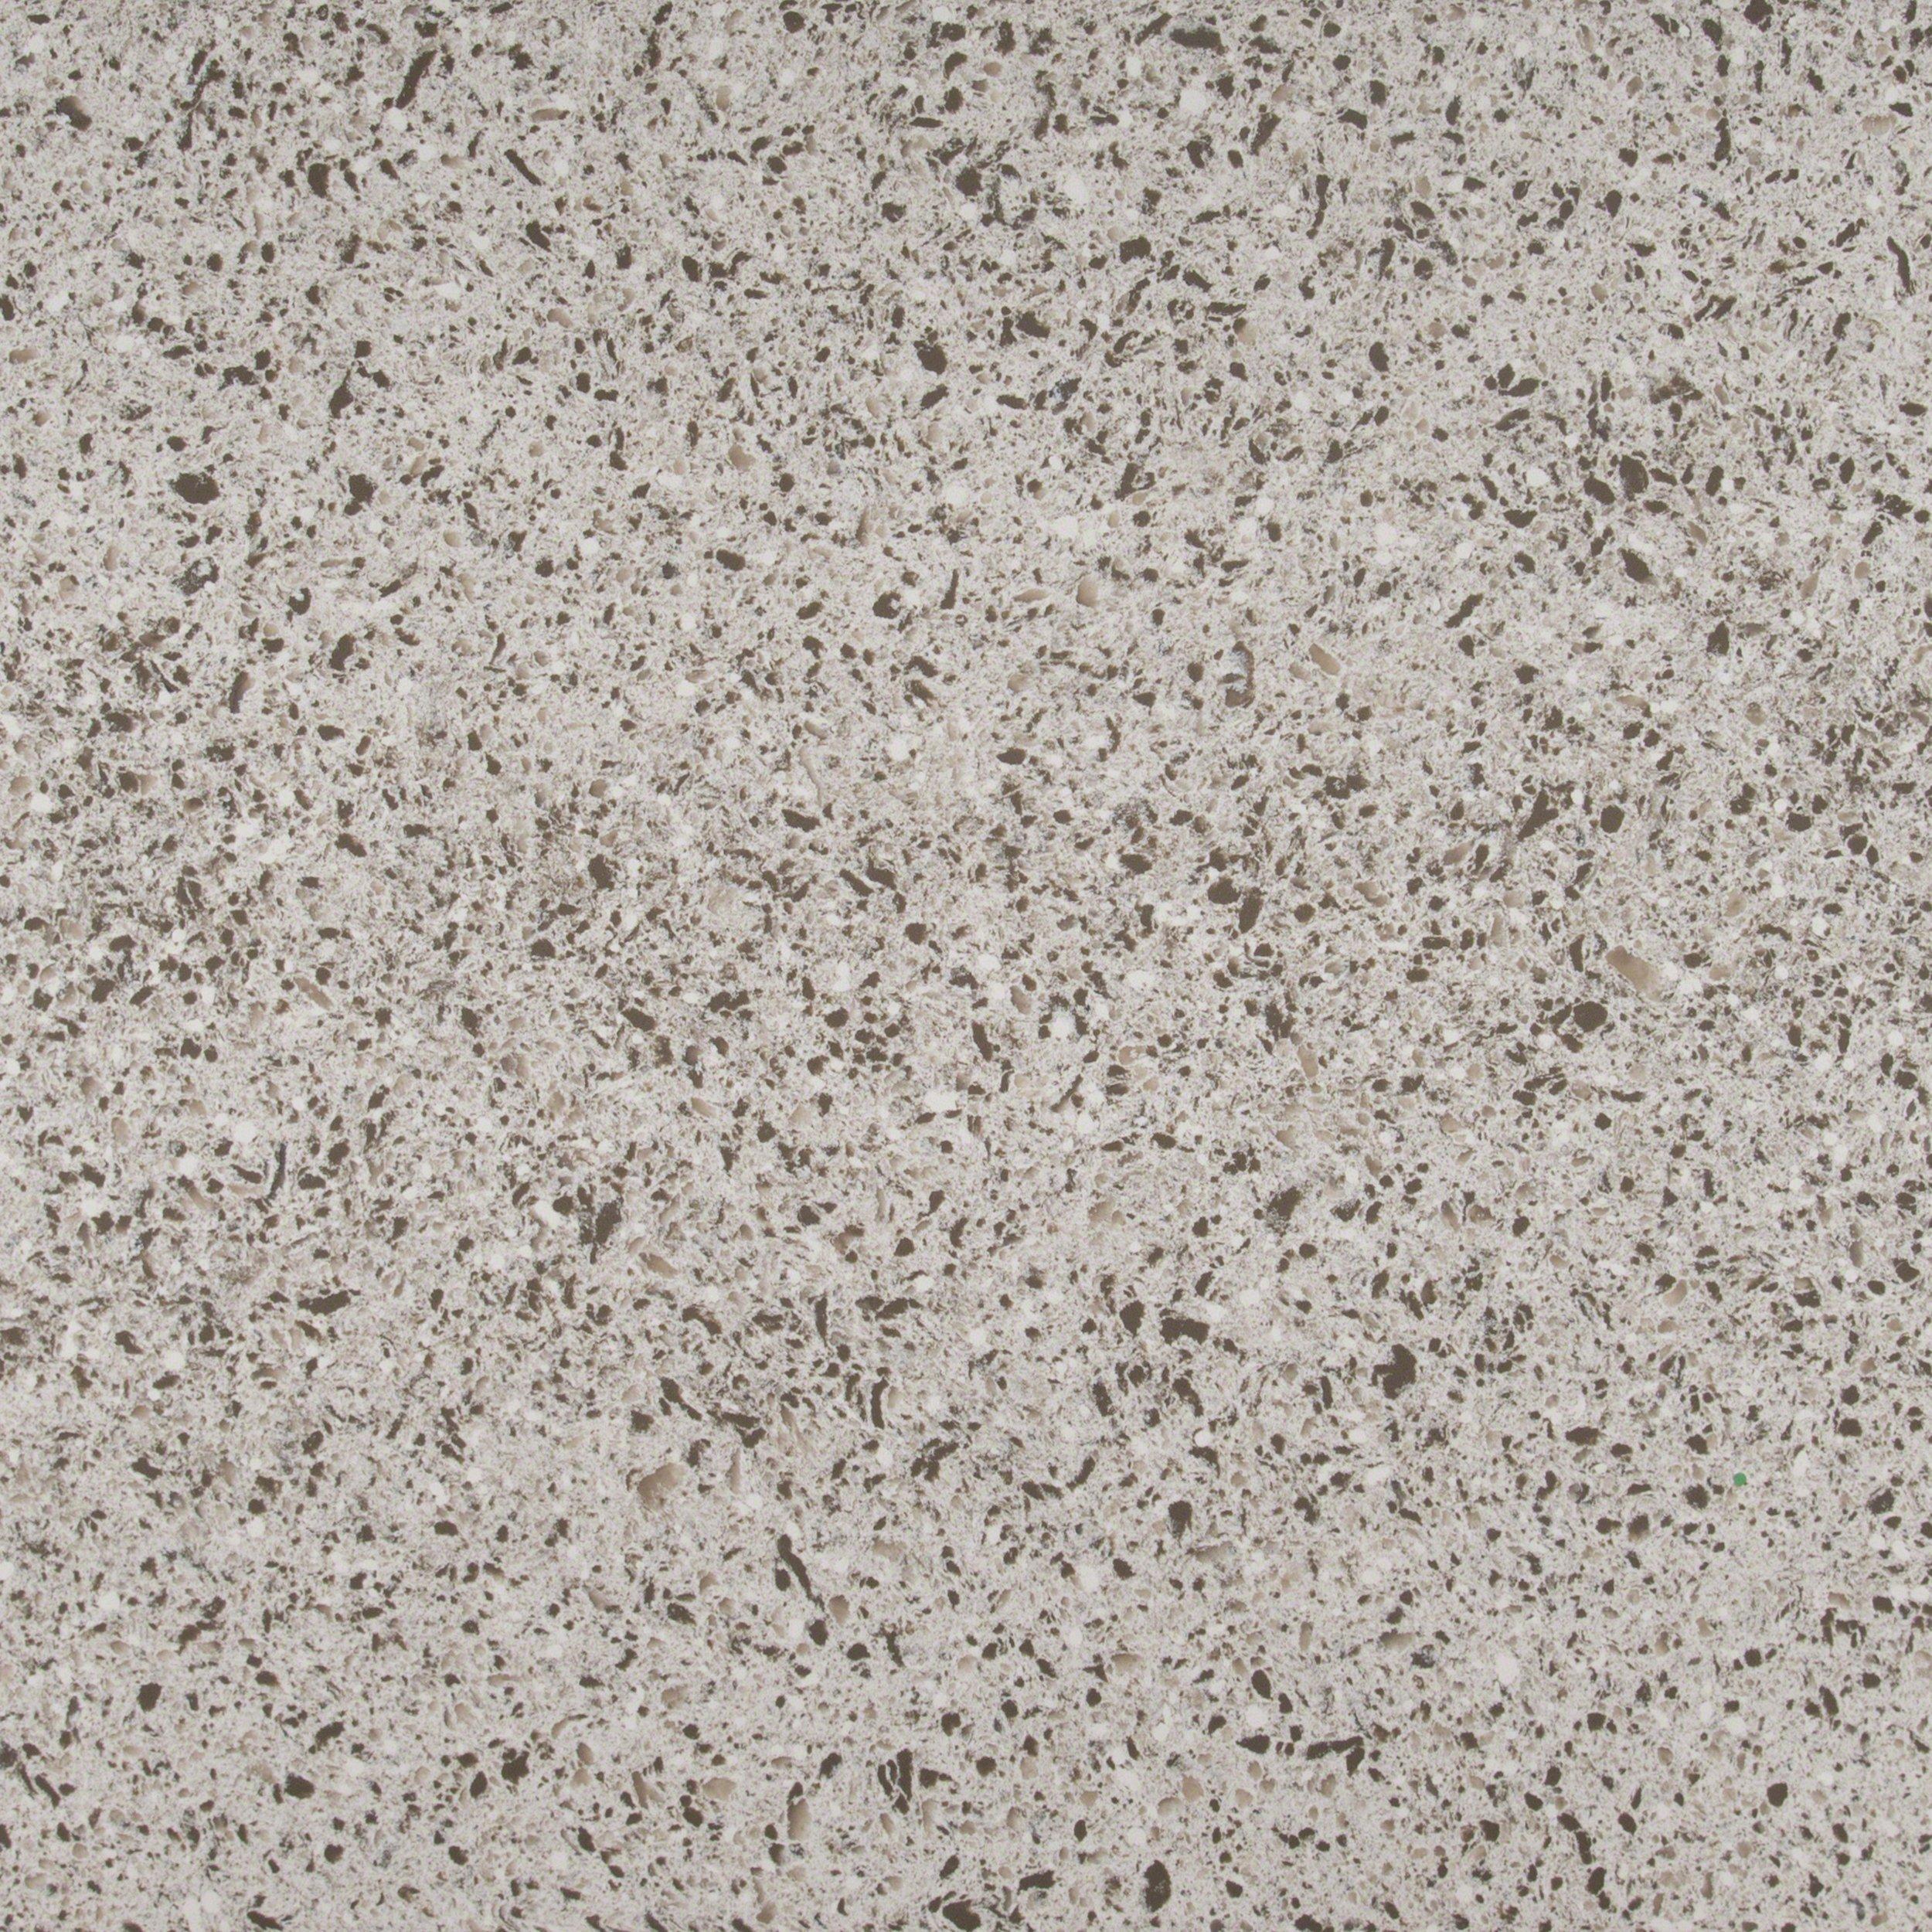 Ready To Install Cascade White Quartz Slab Includes Backsplash   112in. X  26in.   100220961 | Floor And Decor